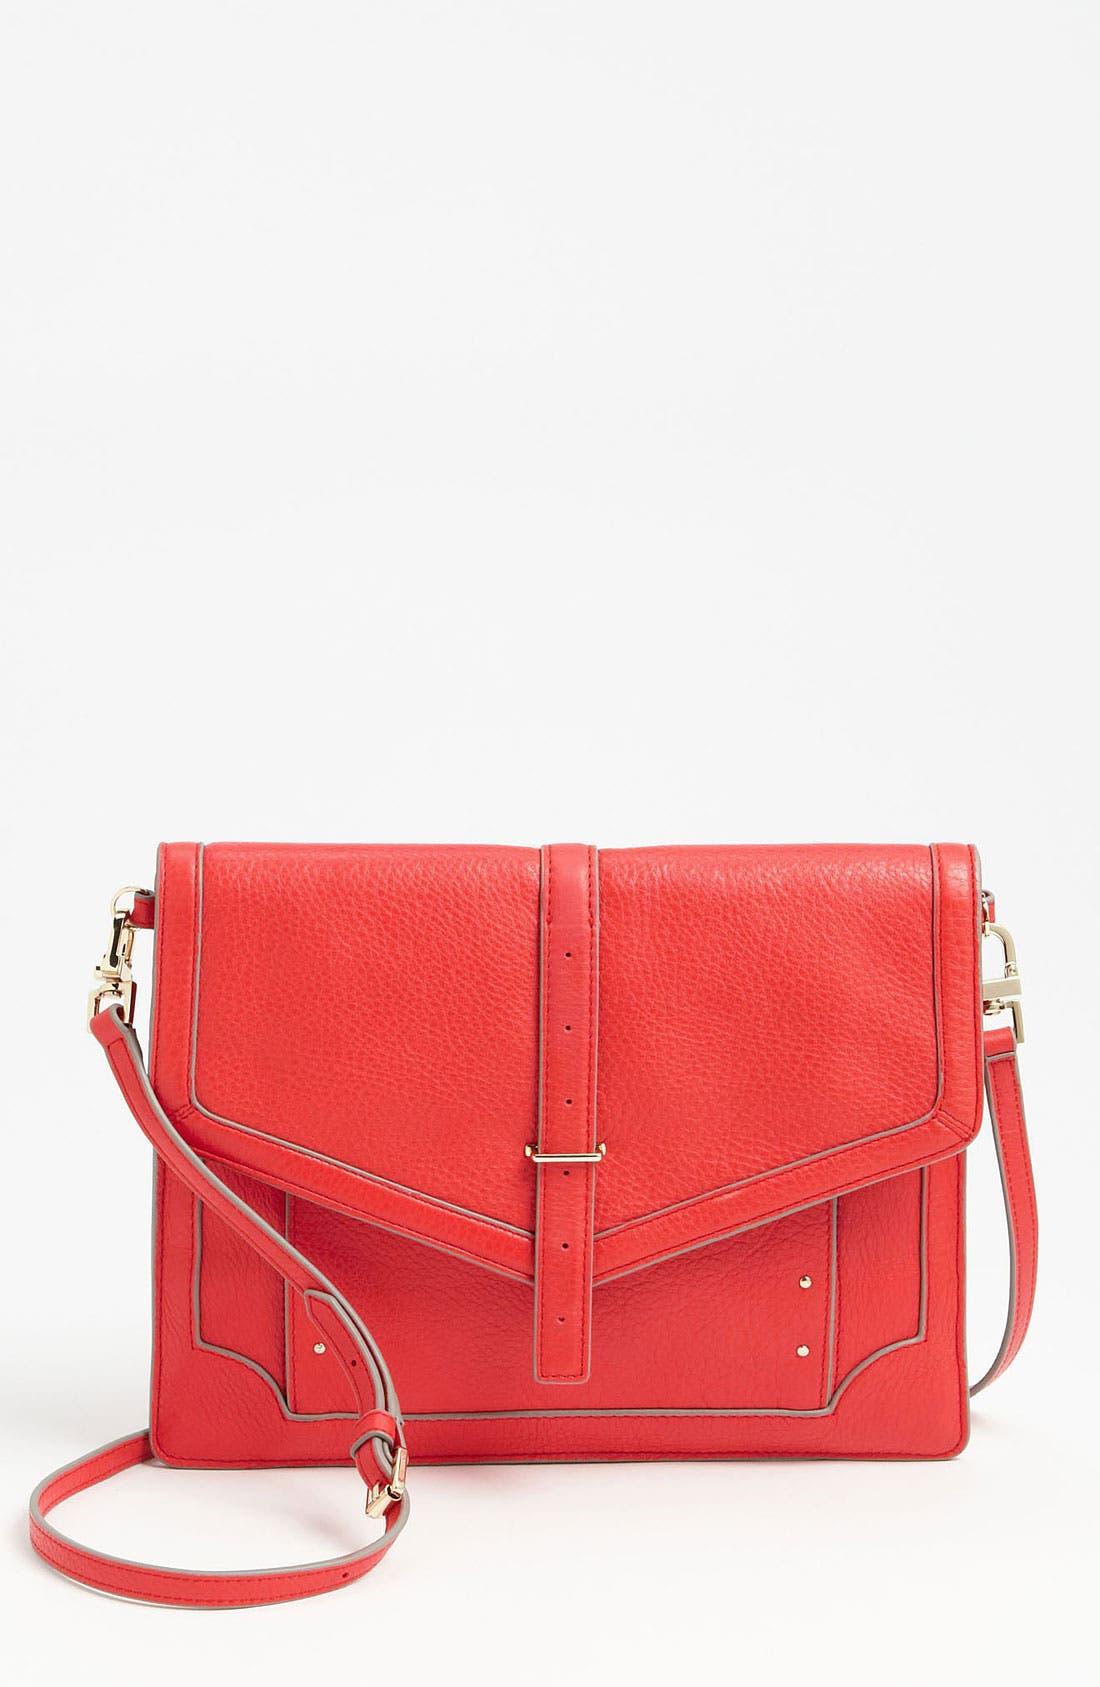 Main Image - Tory Burch Leather Crossbody Bag